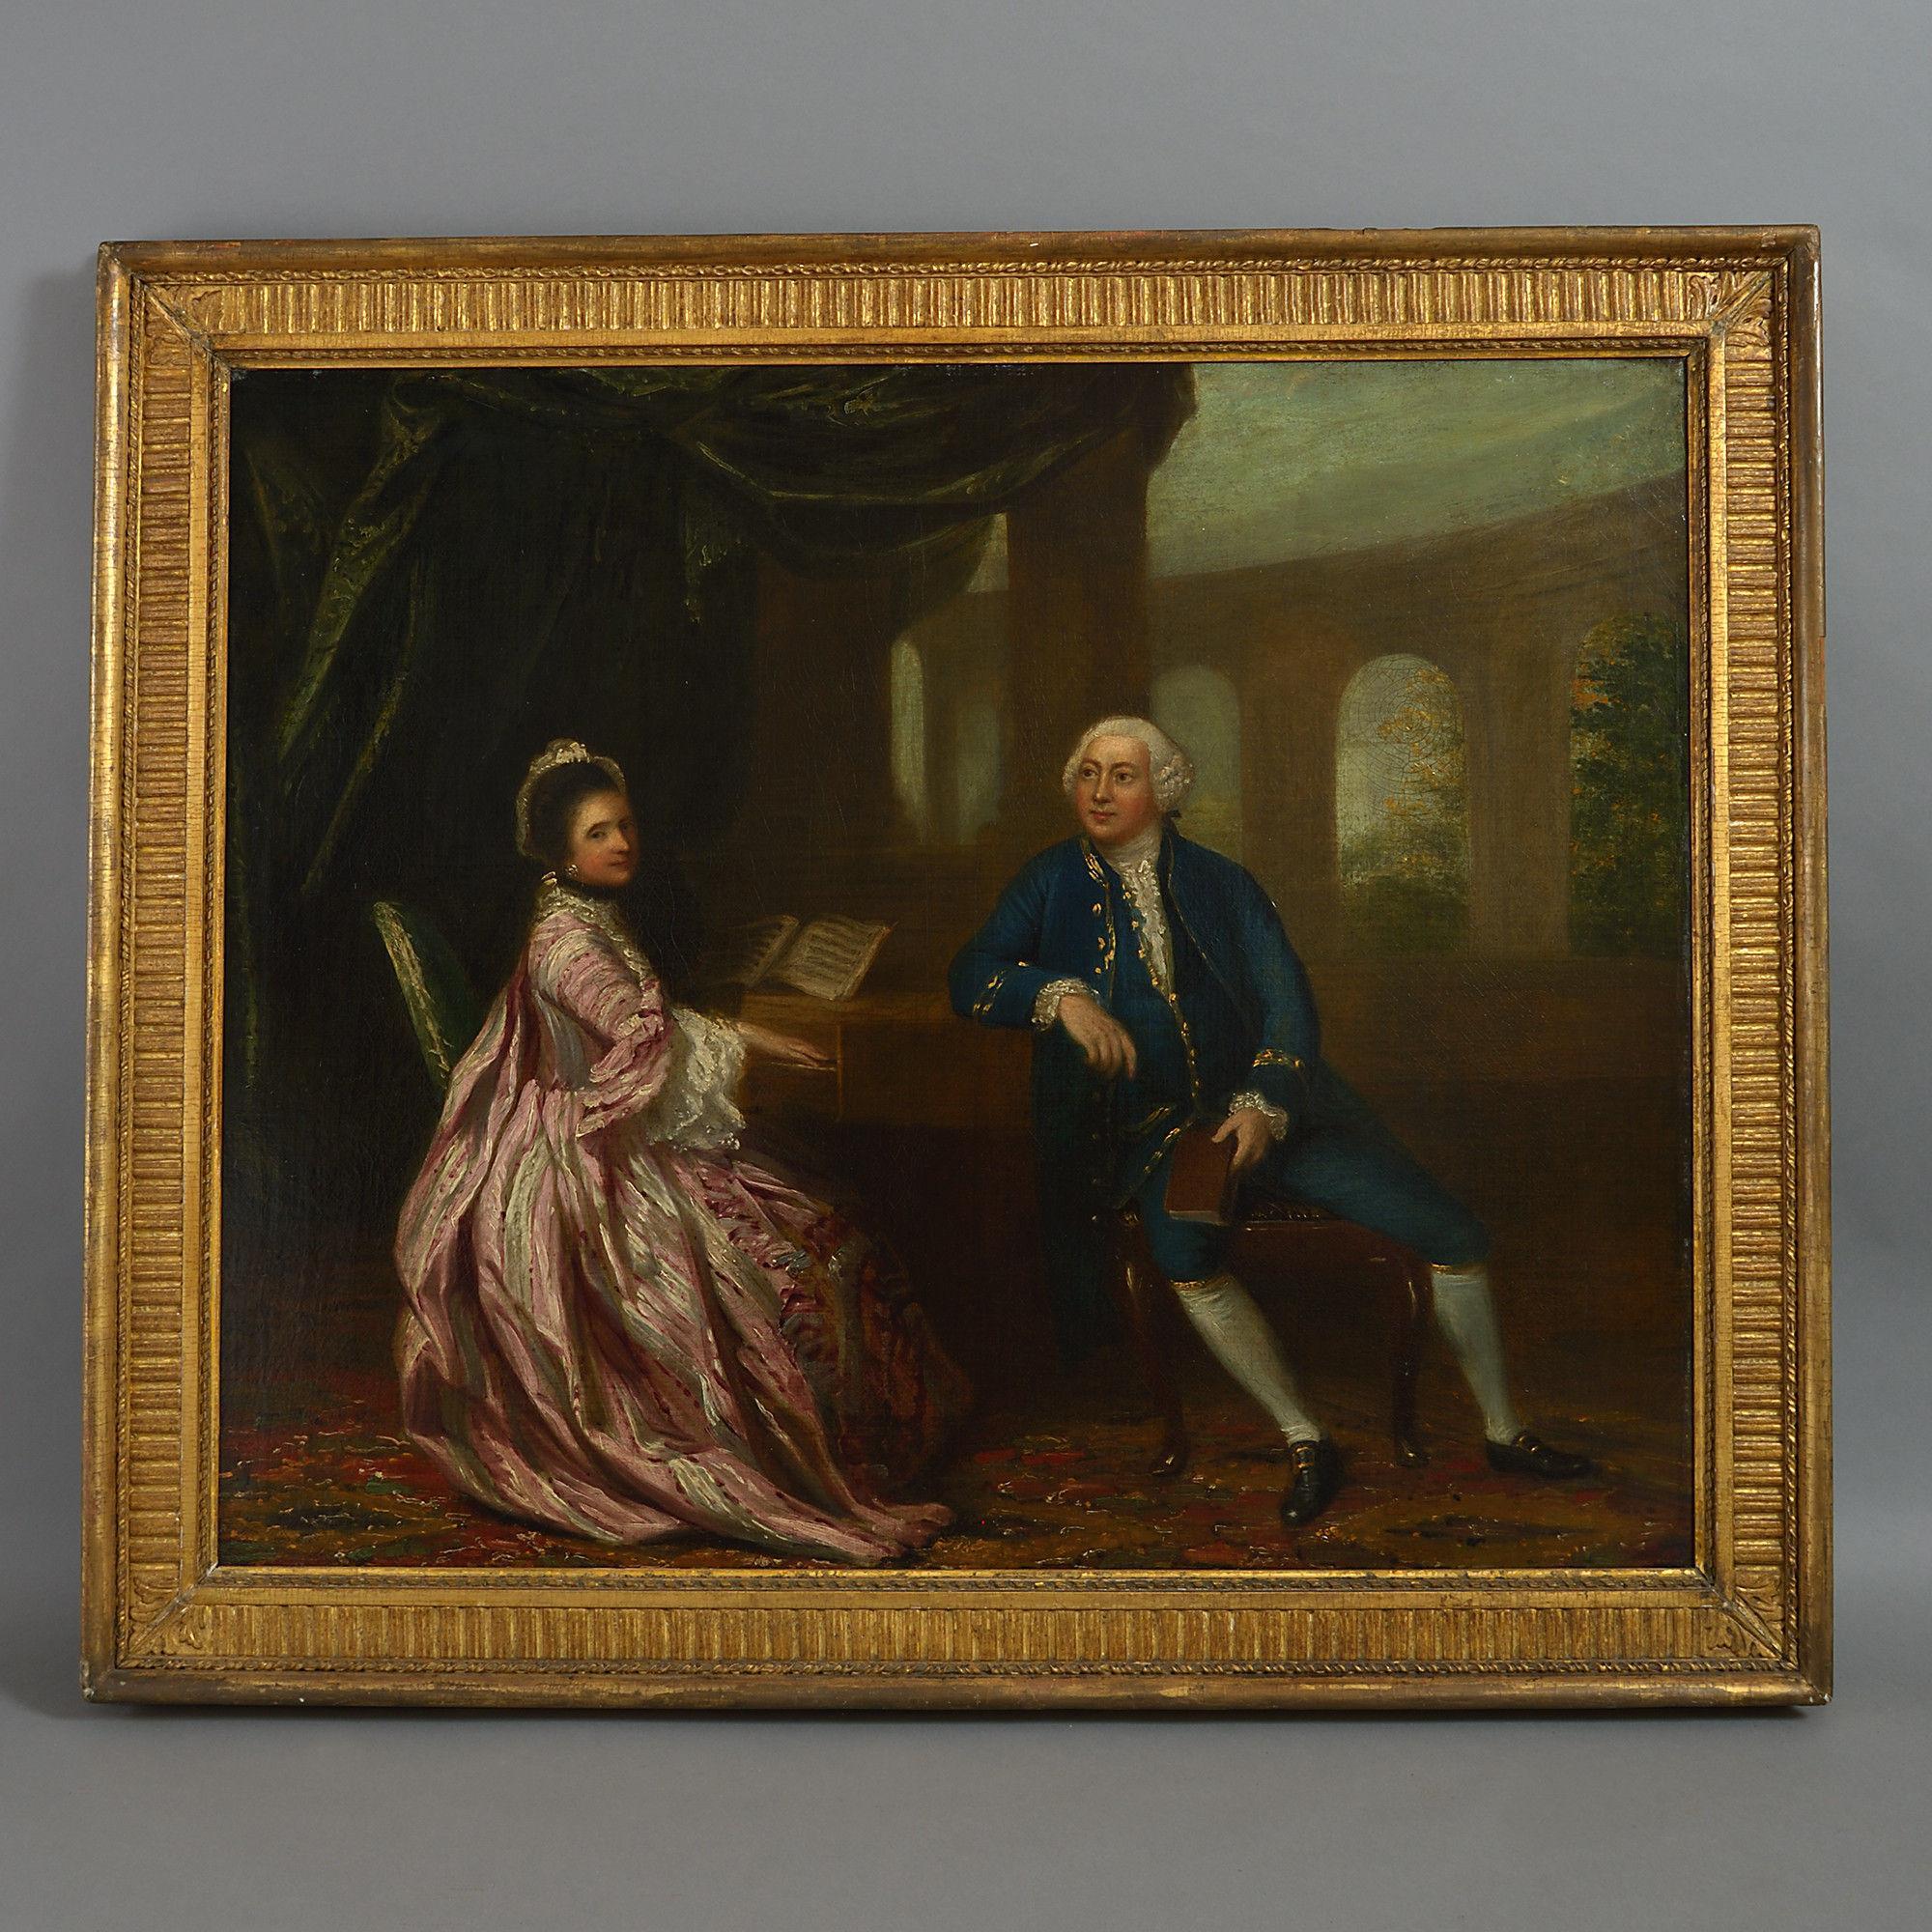 18th Century Double Portrait, Follower of Sir Joshua Reynolds Oil on Canvas